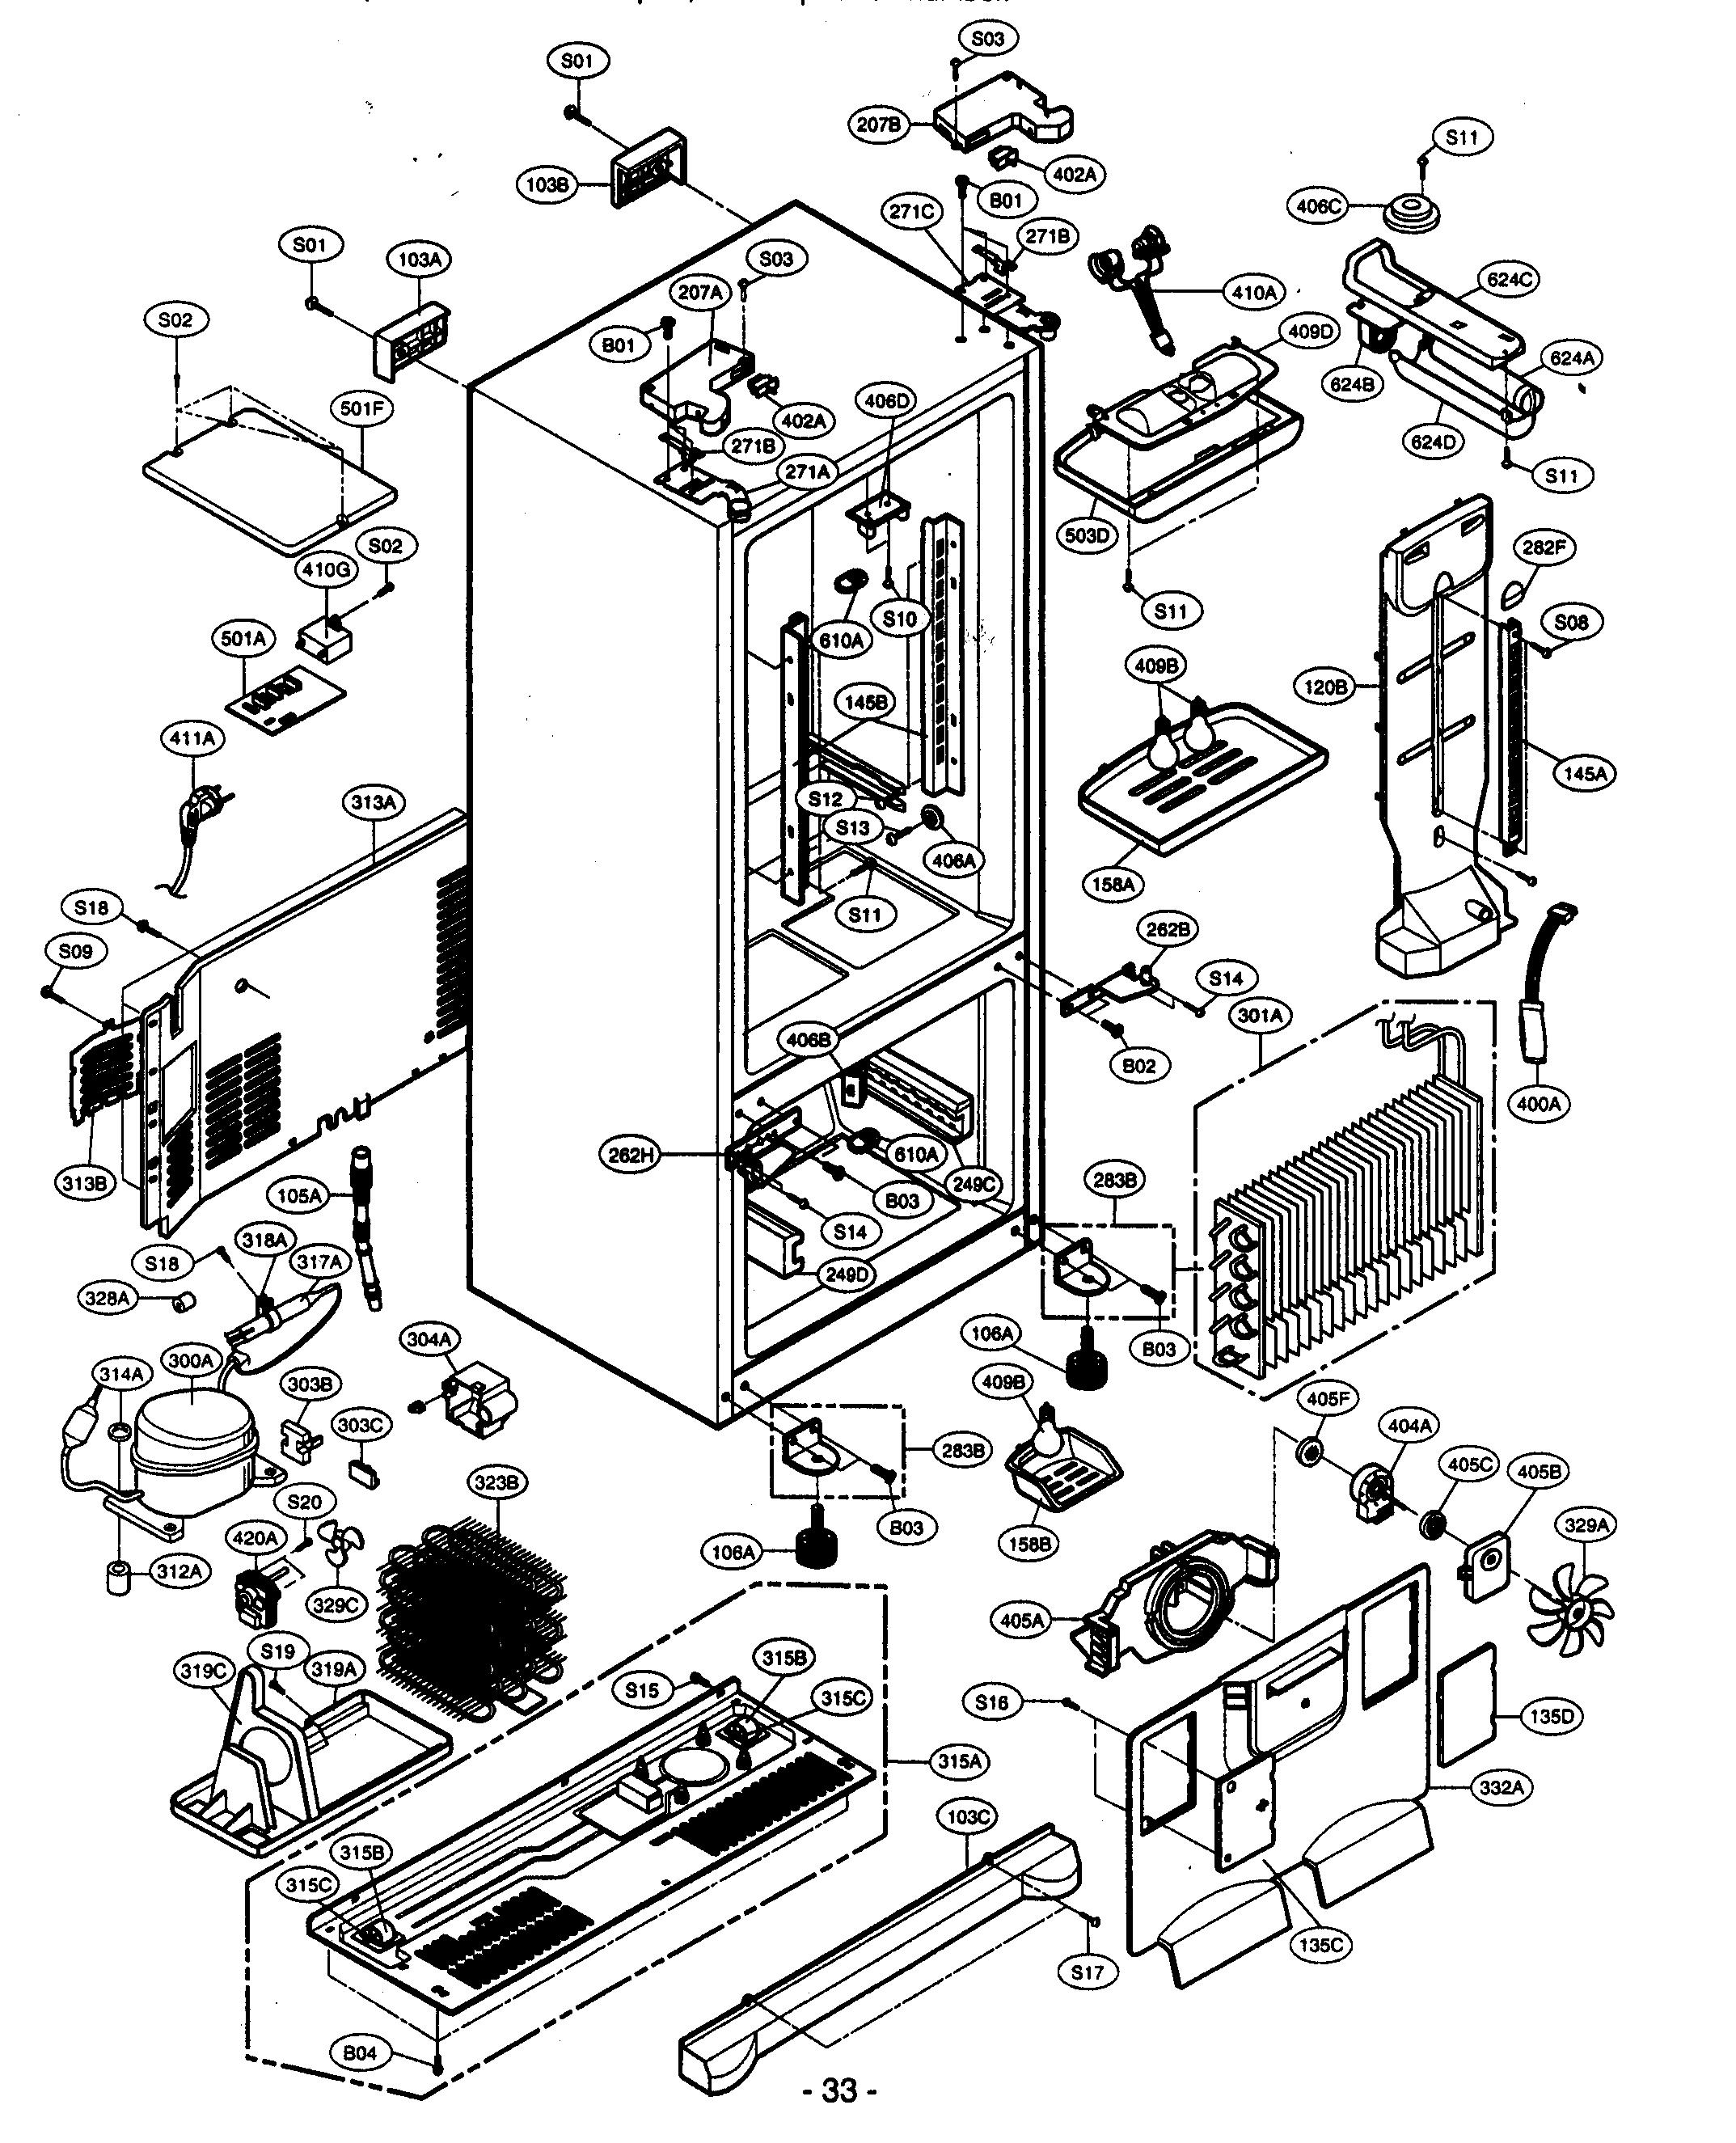 kenmore elite refrigerator model 795 service manual